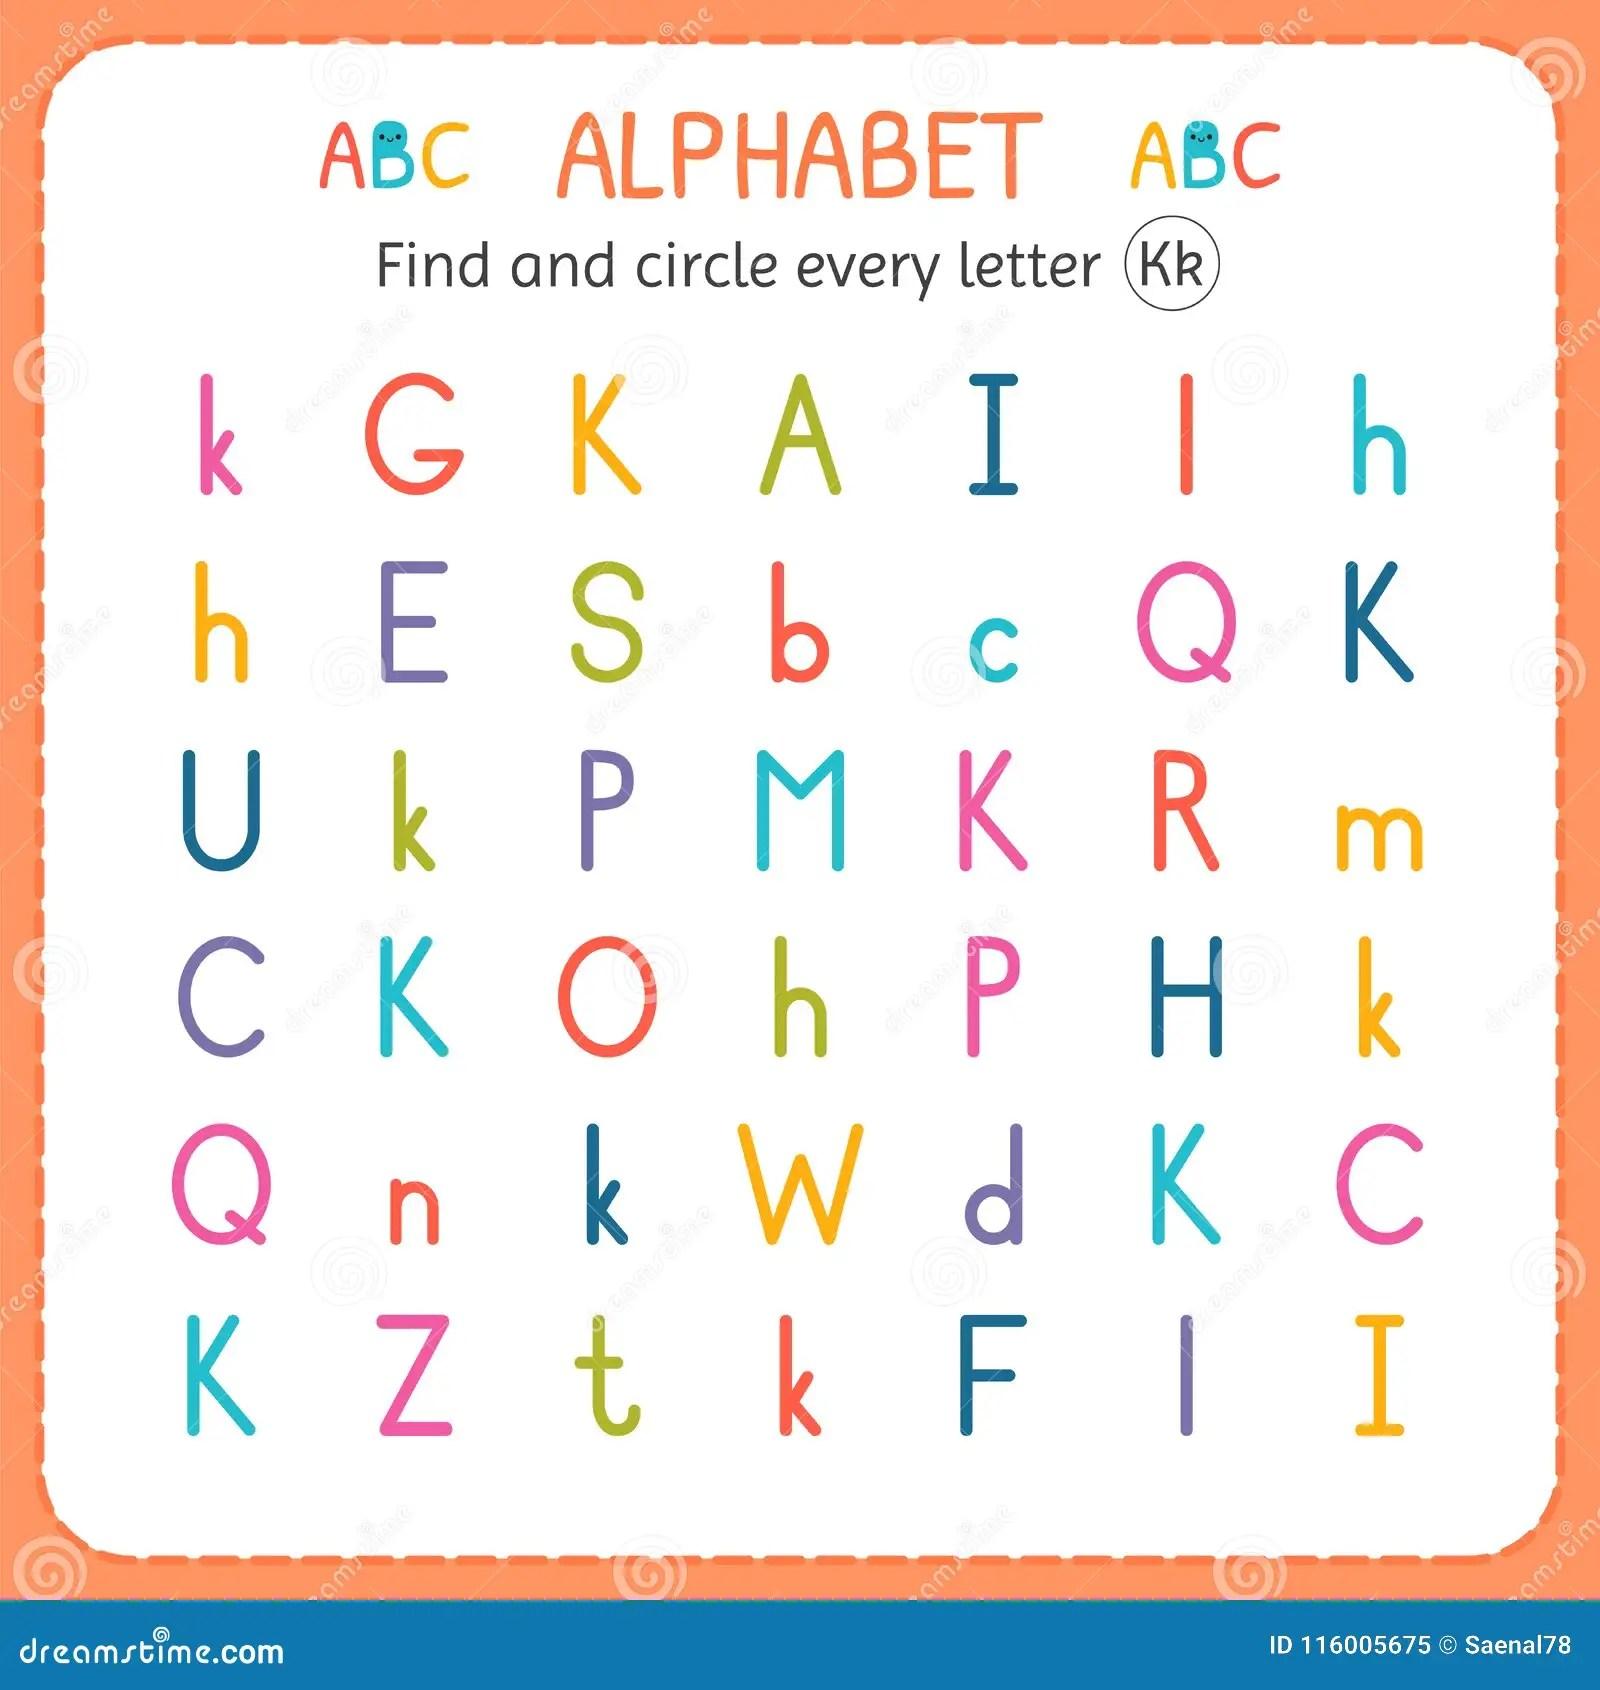 Find And Circle Every Letter K Worksheet For Kindergarten And Preschool Exercises For Children